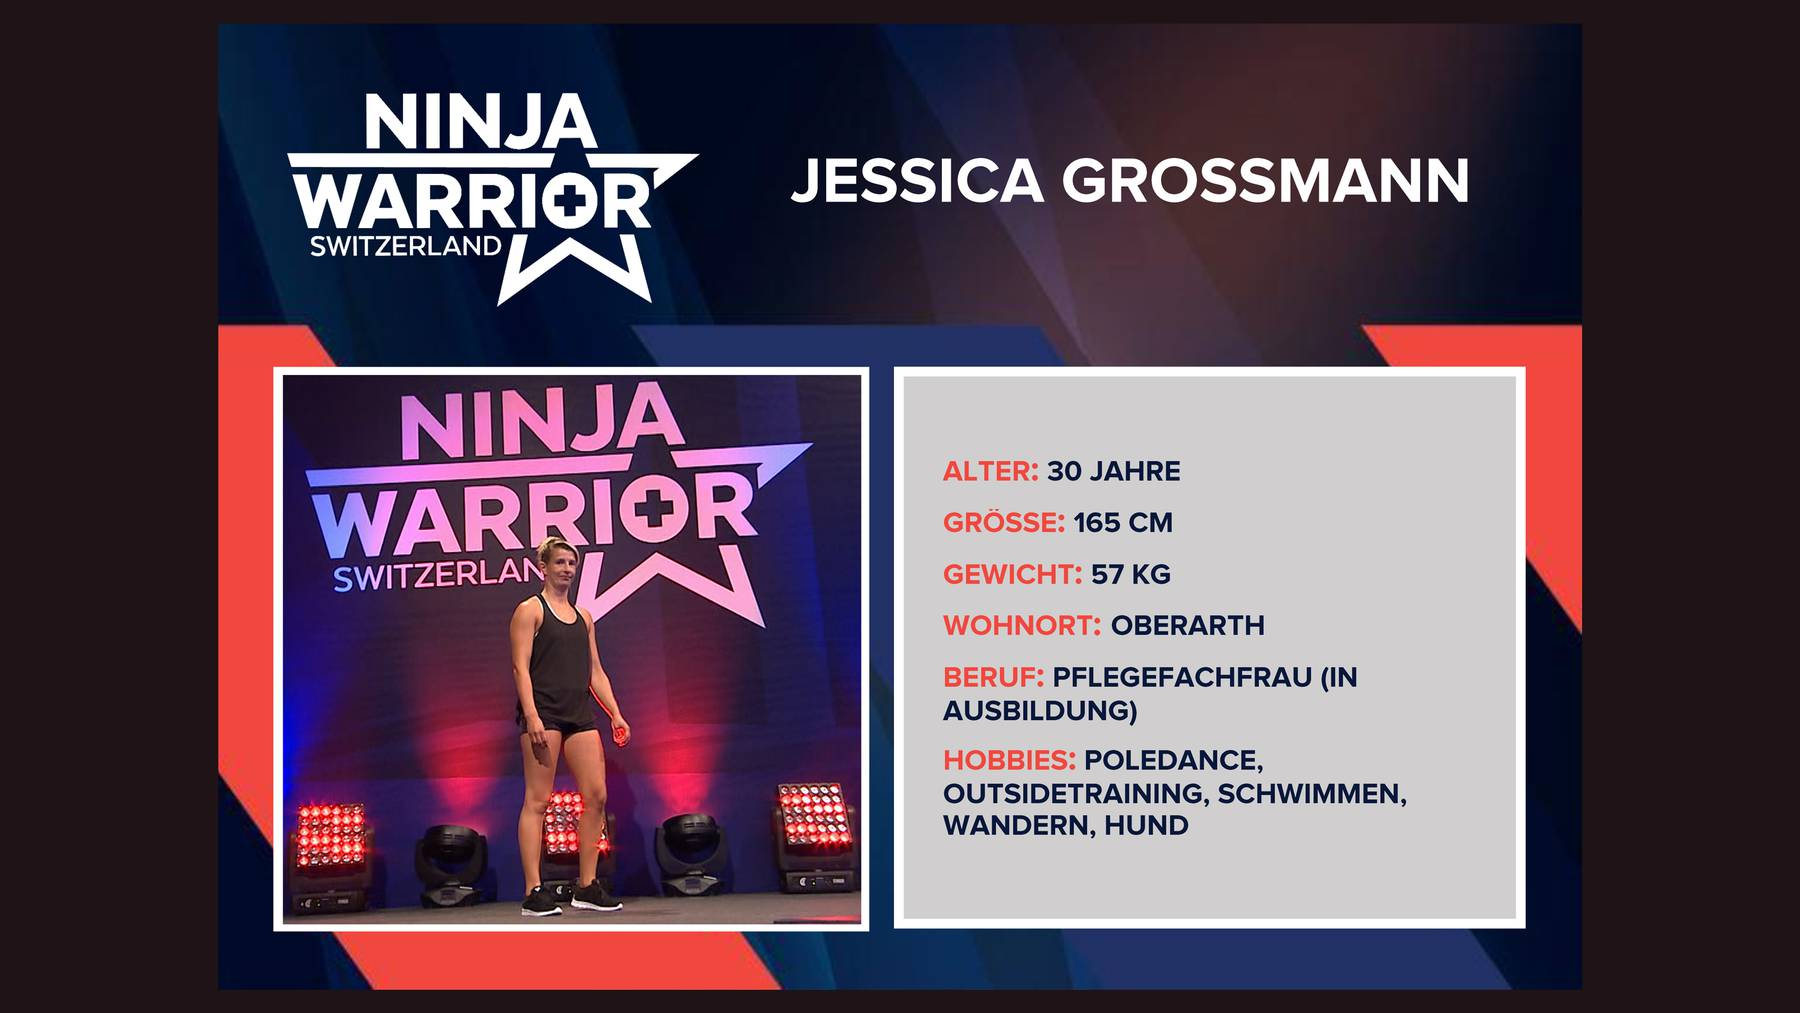 Jessica Grossmann